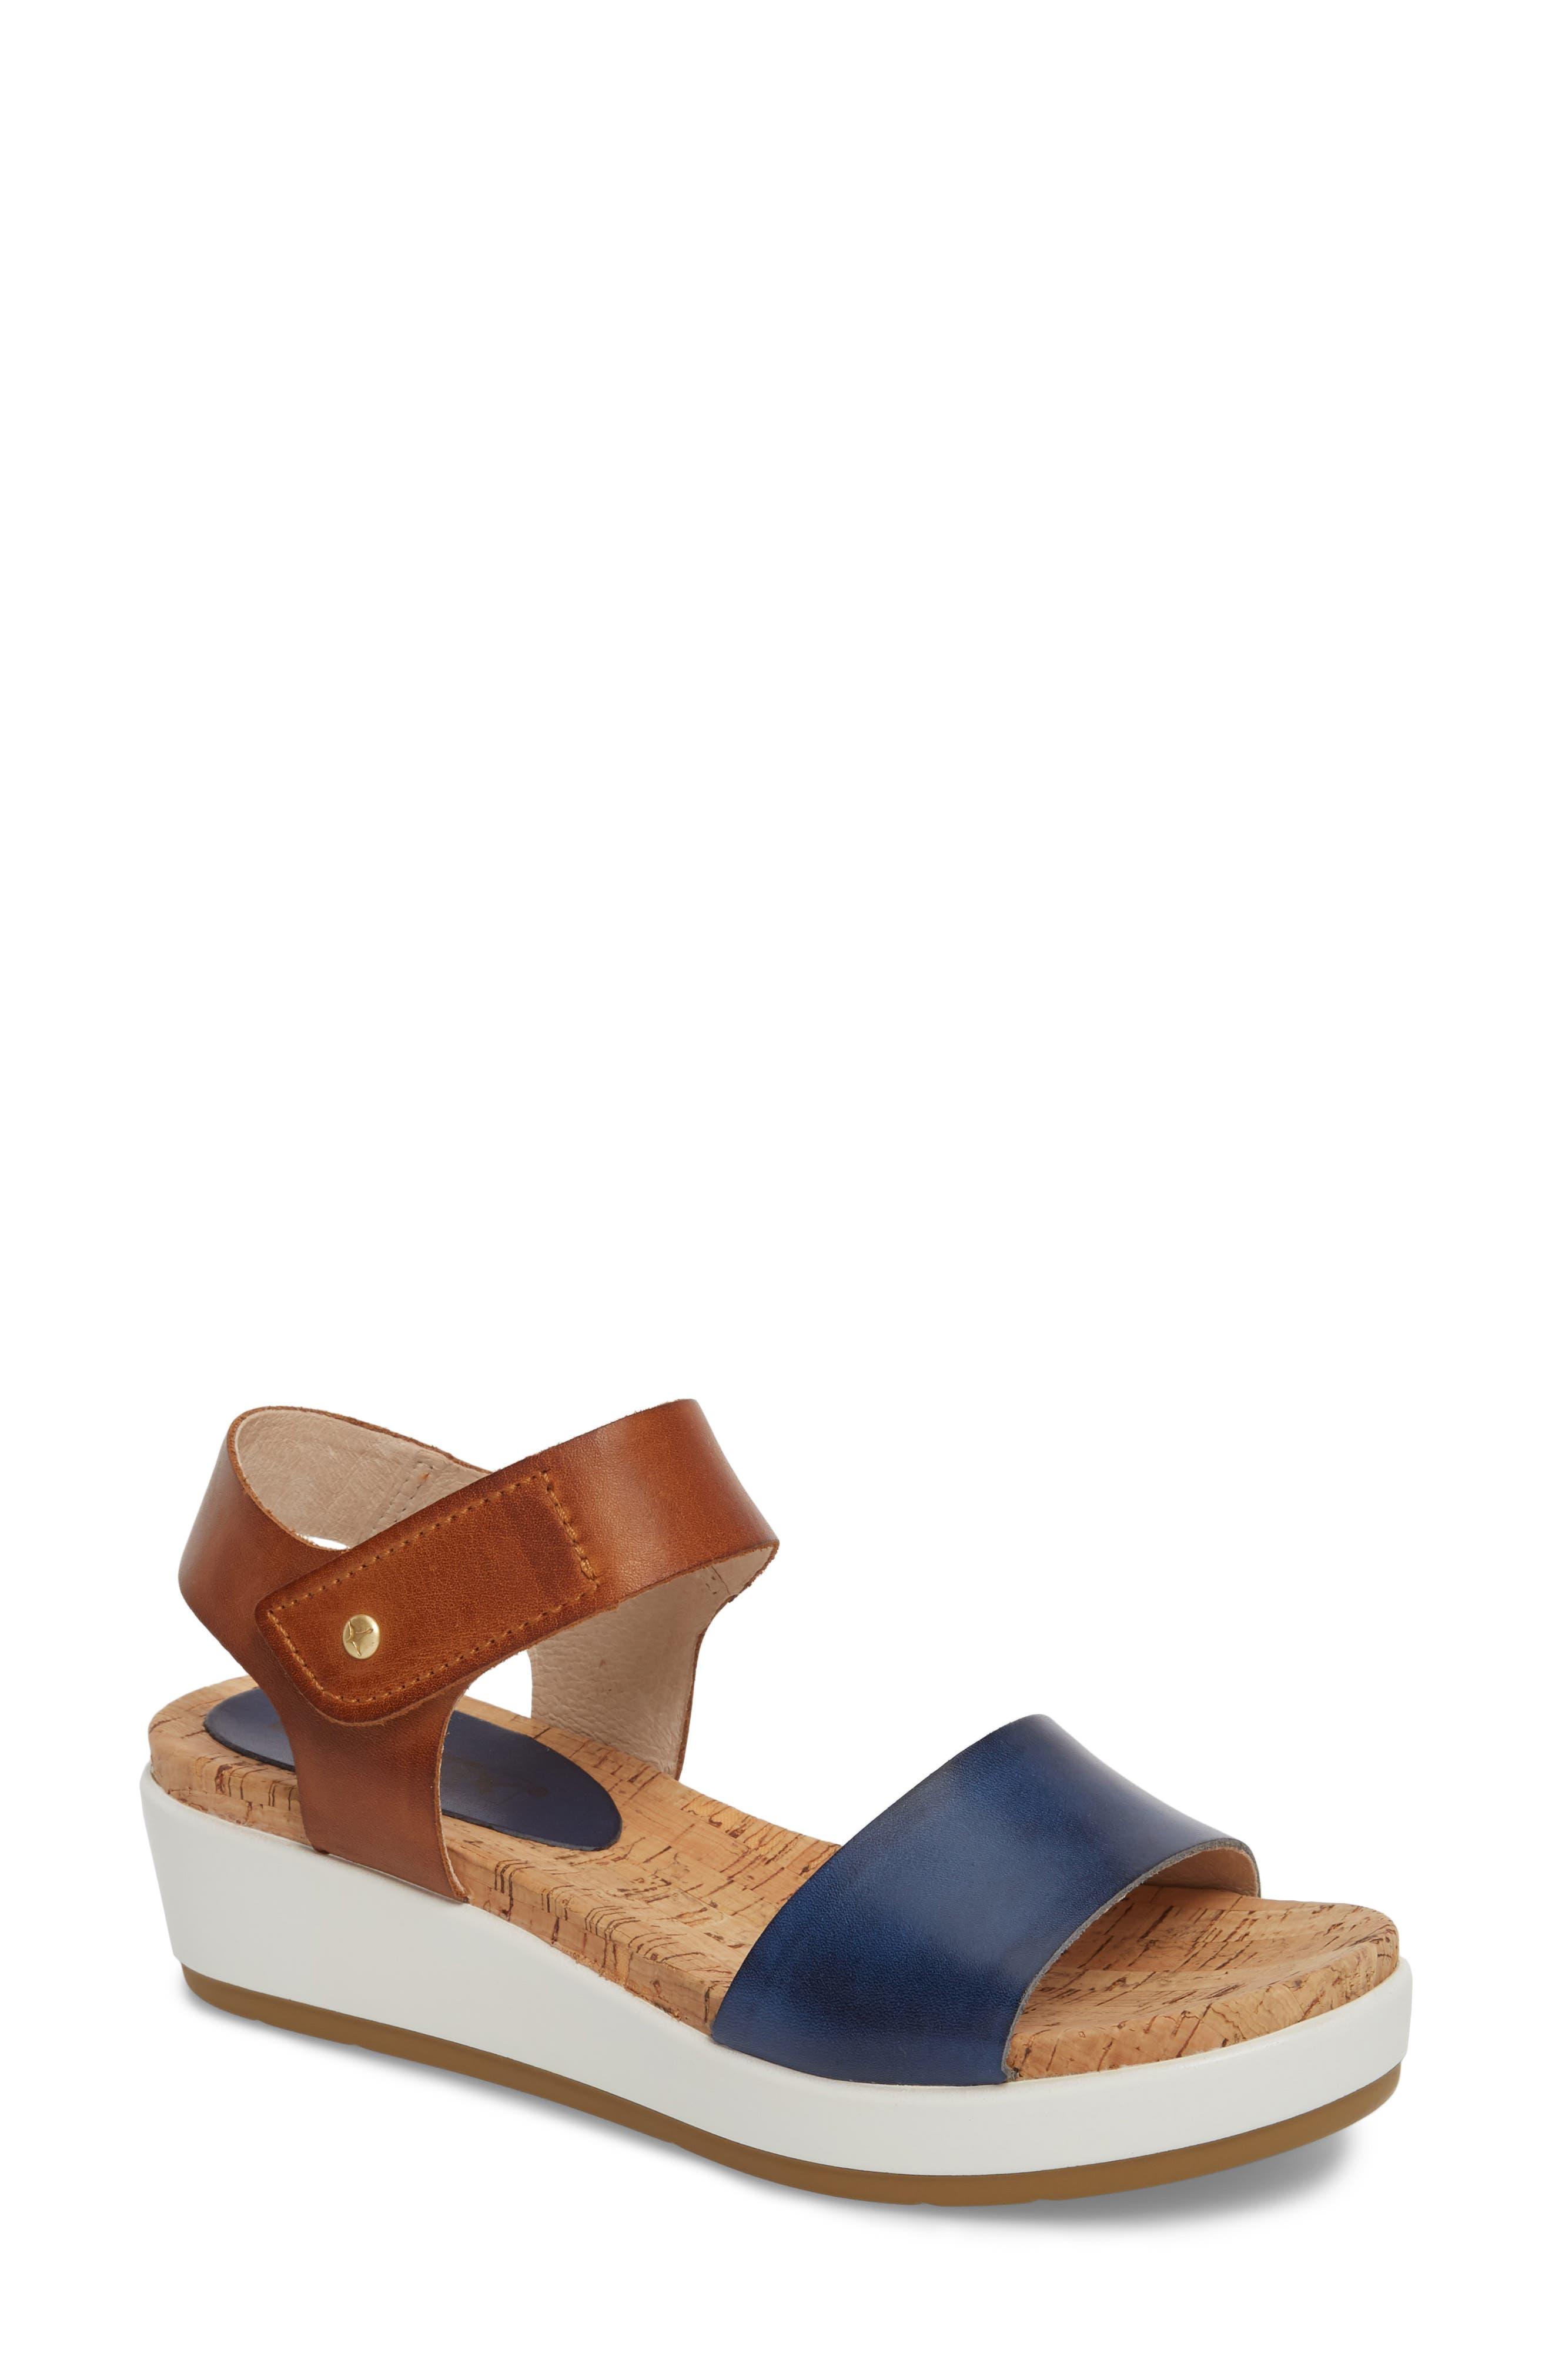 Mykonos Sport Sandal,                             Main thumbnail 1, color,                             Royal Blue Leather